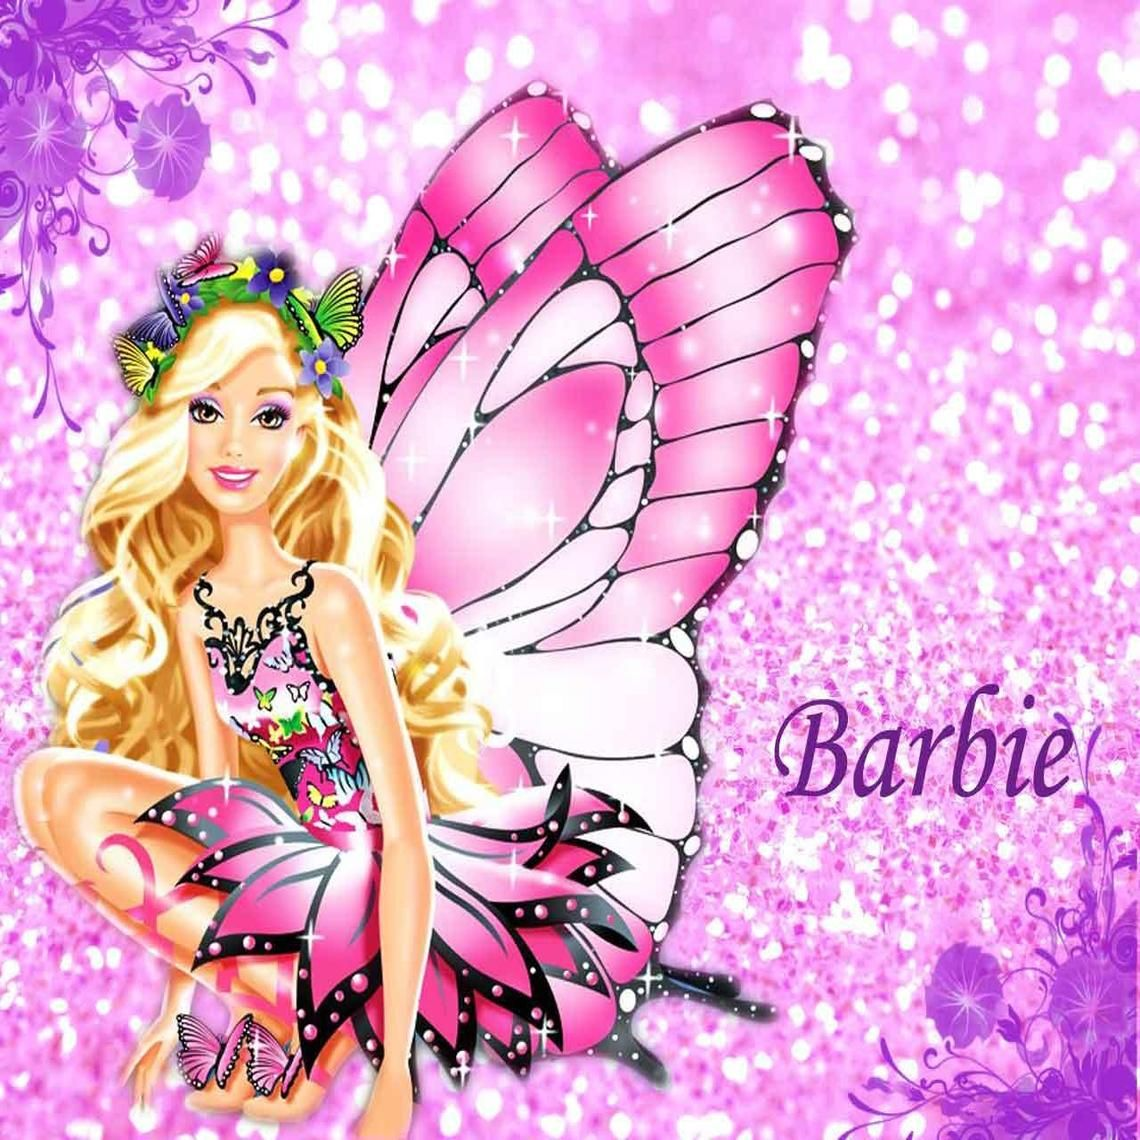 Barbiemariposawallpaper6 Barbie Marcos Imprimibles Y